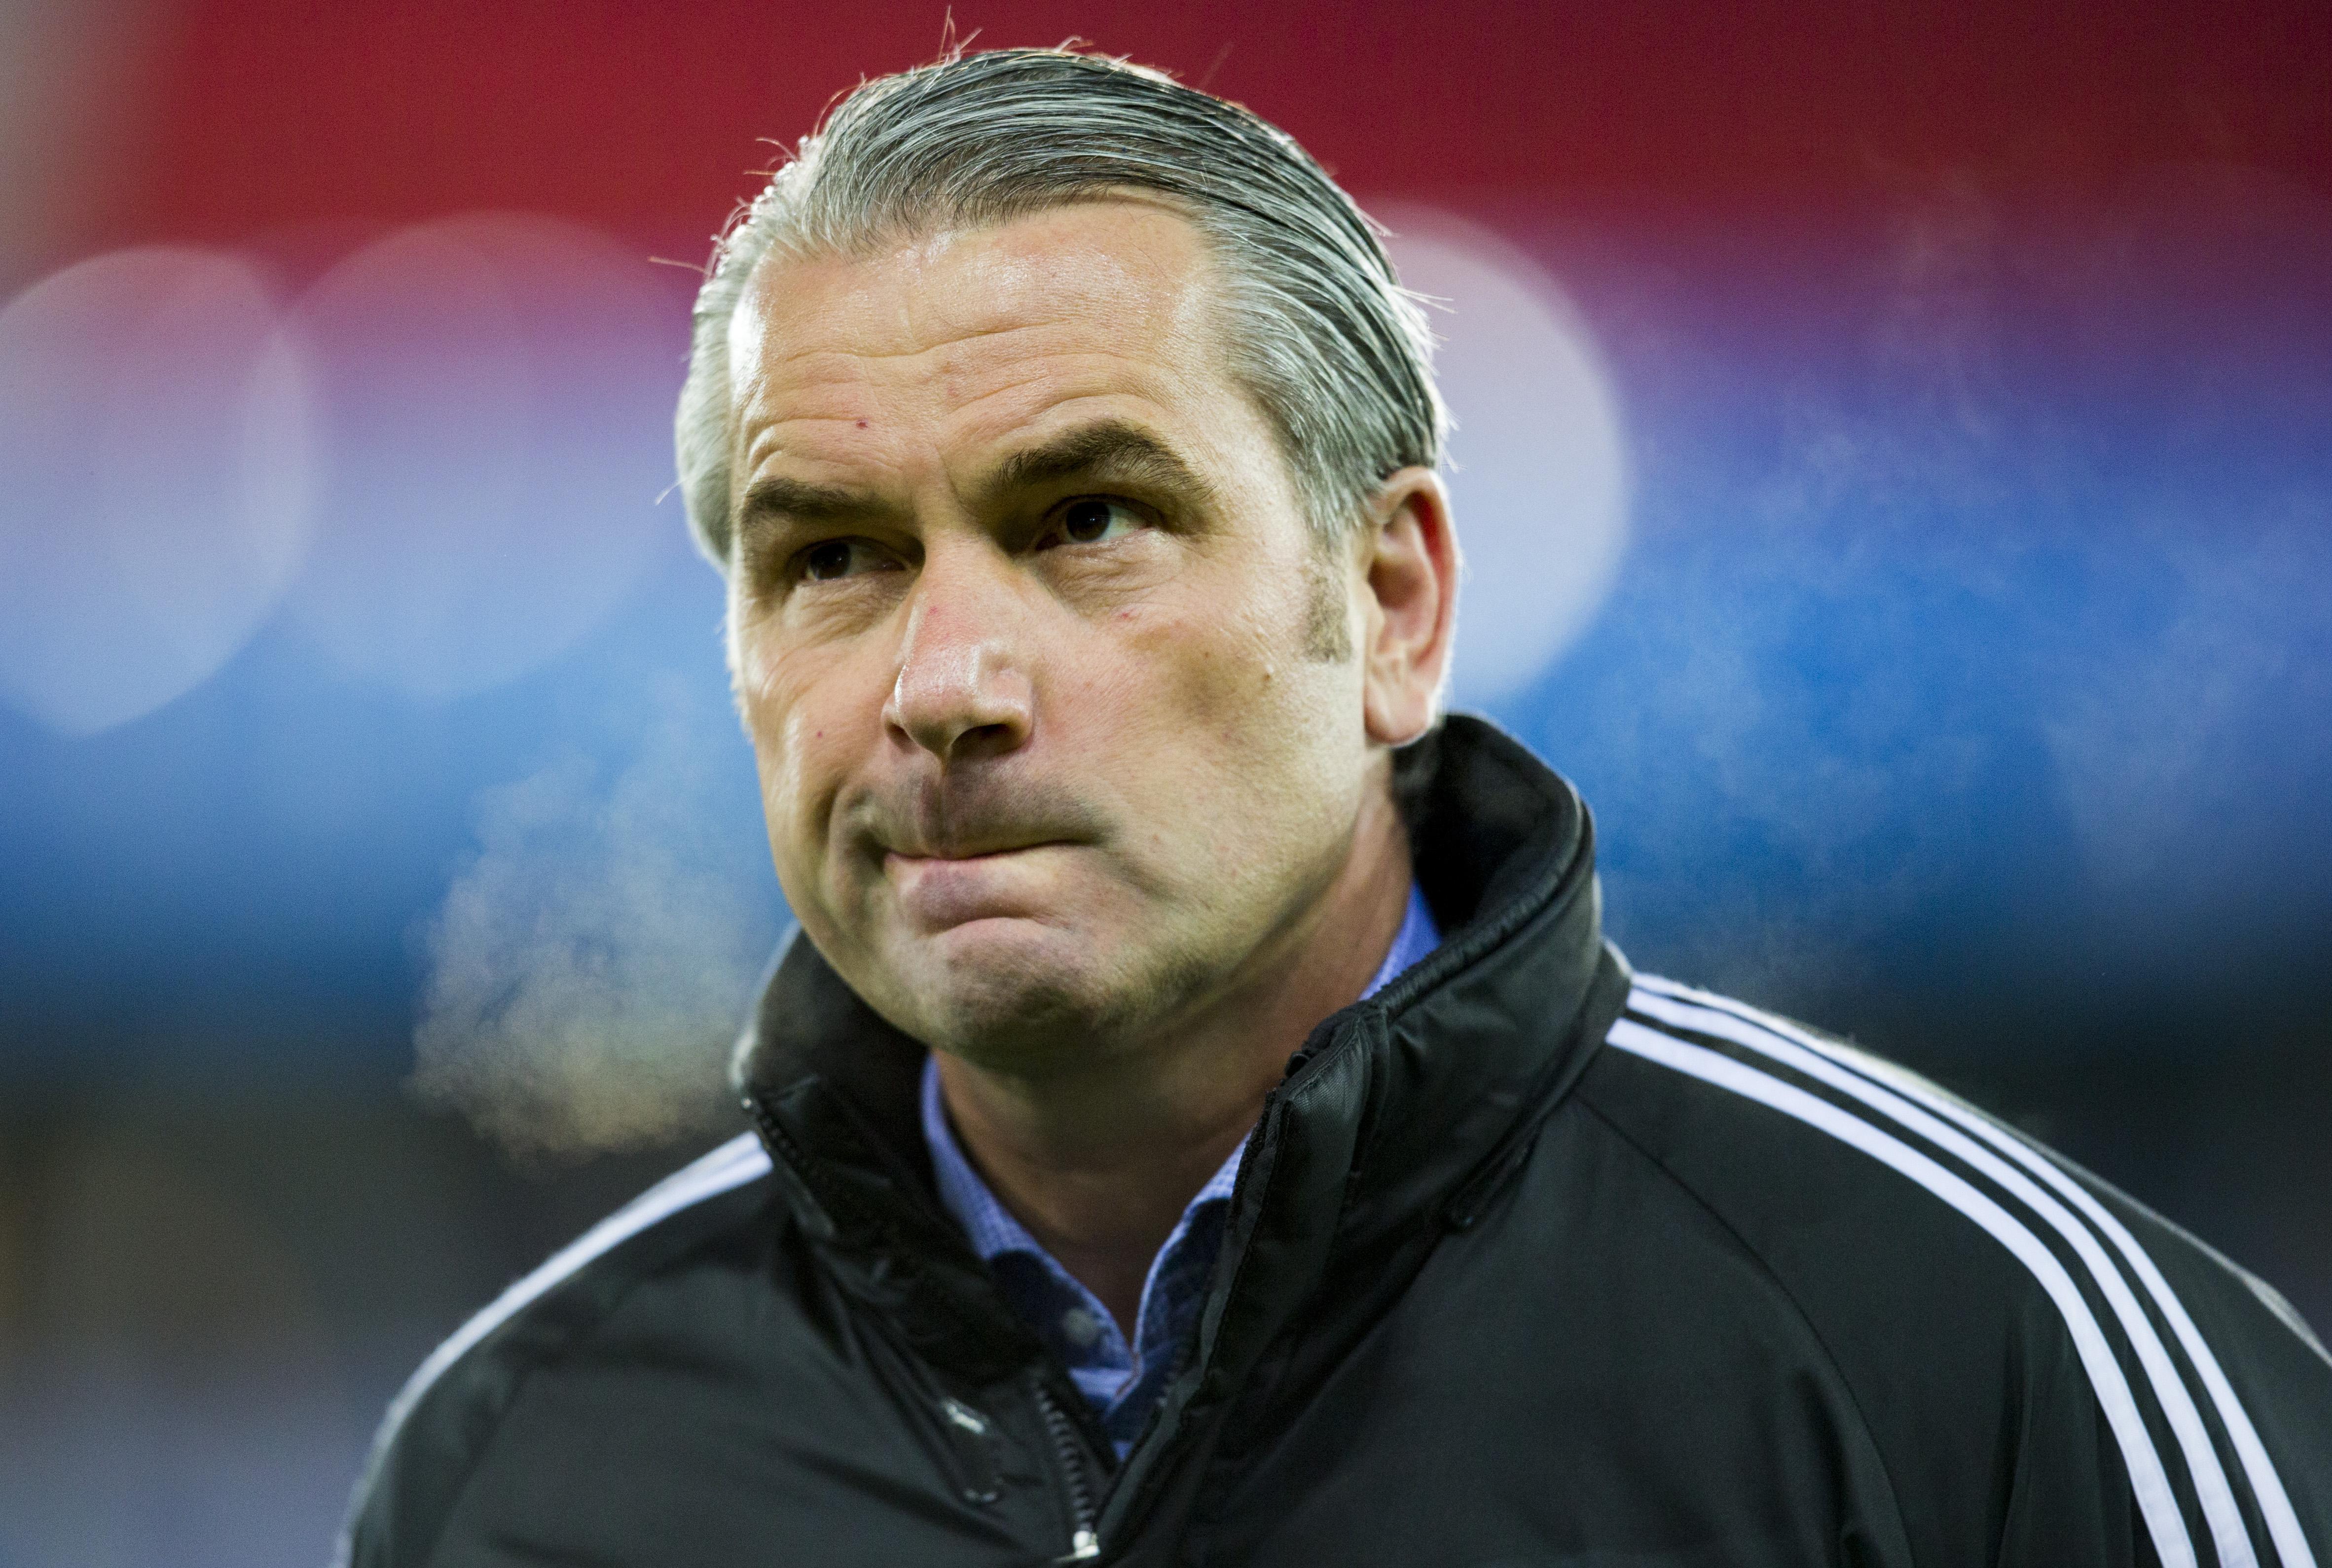 Norvegia-Ungheria 0-1, le foto del match